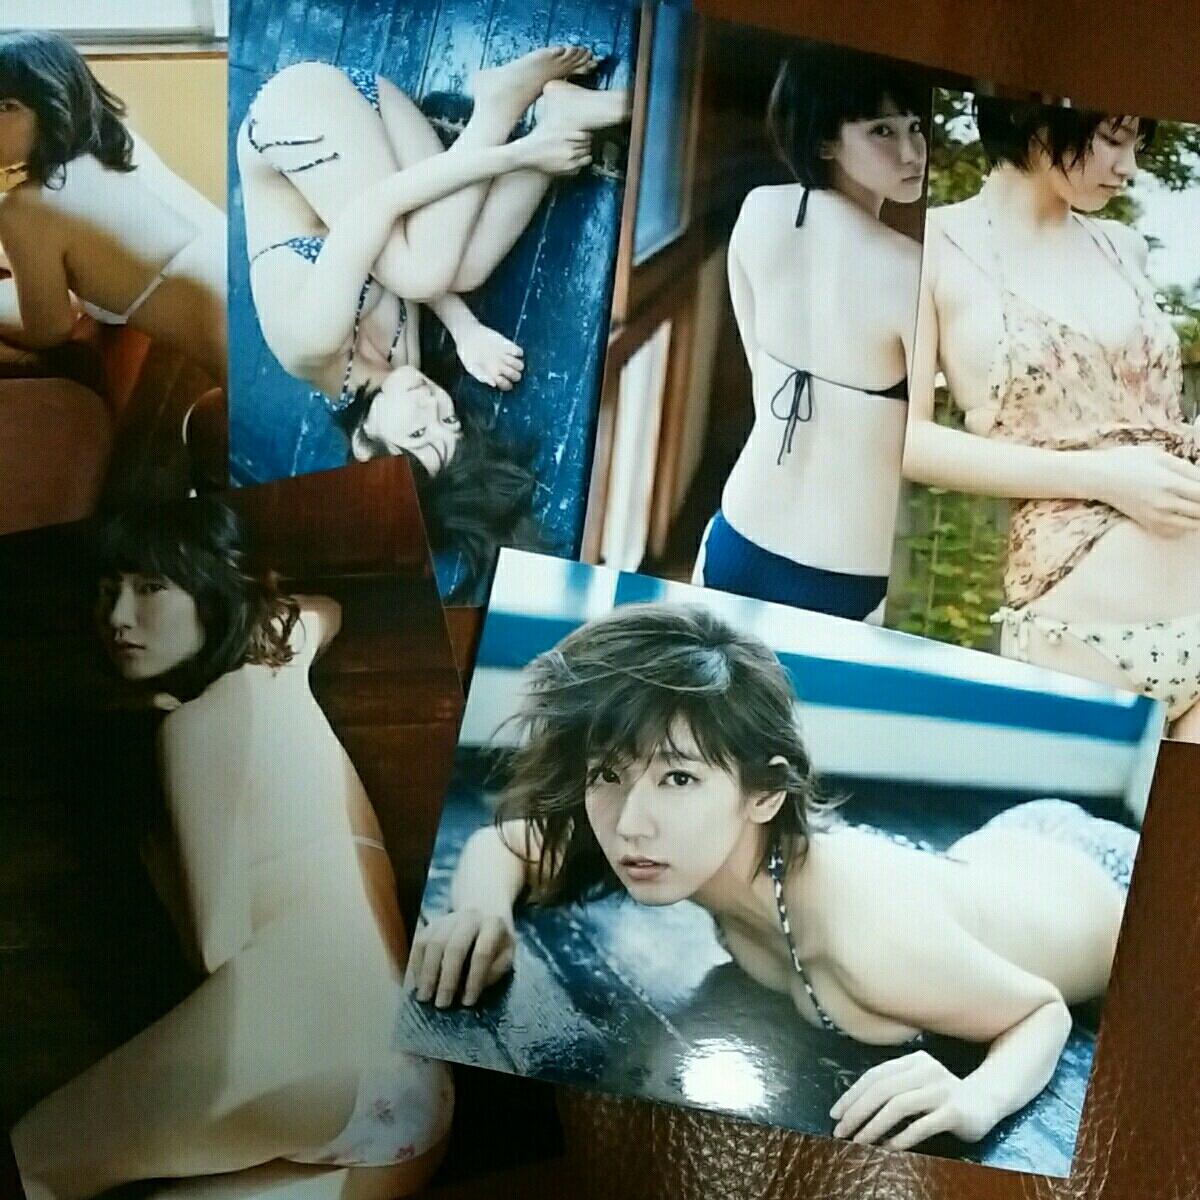 吉岡里帆 ② 高画質L判フォト 100枚(生写真)